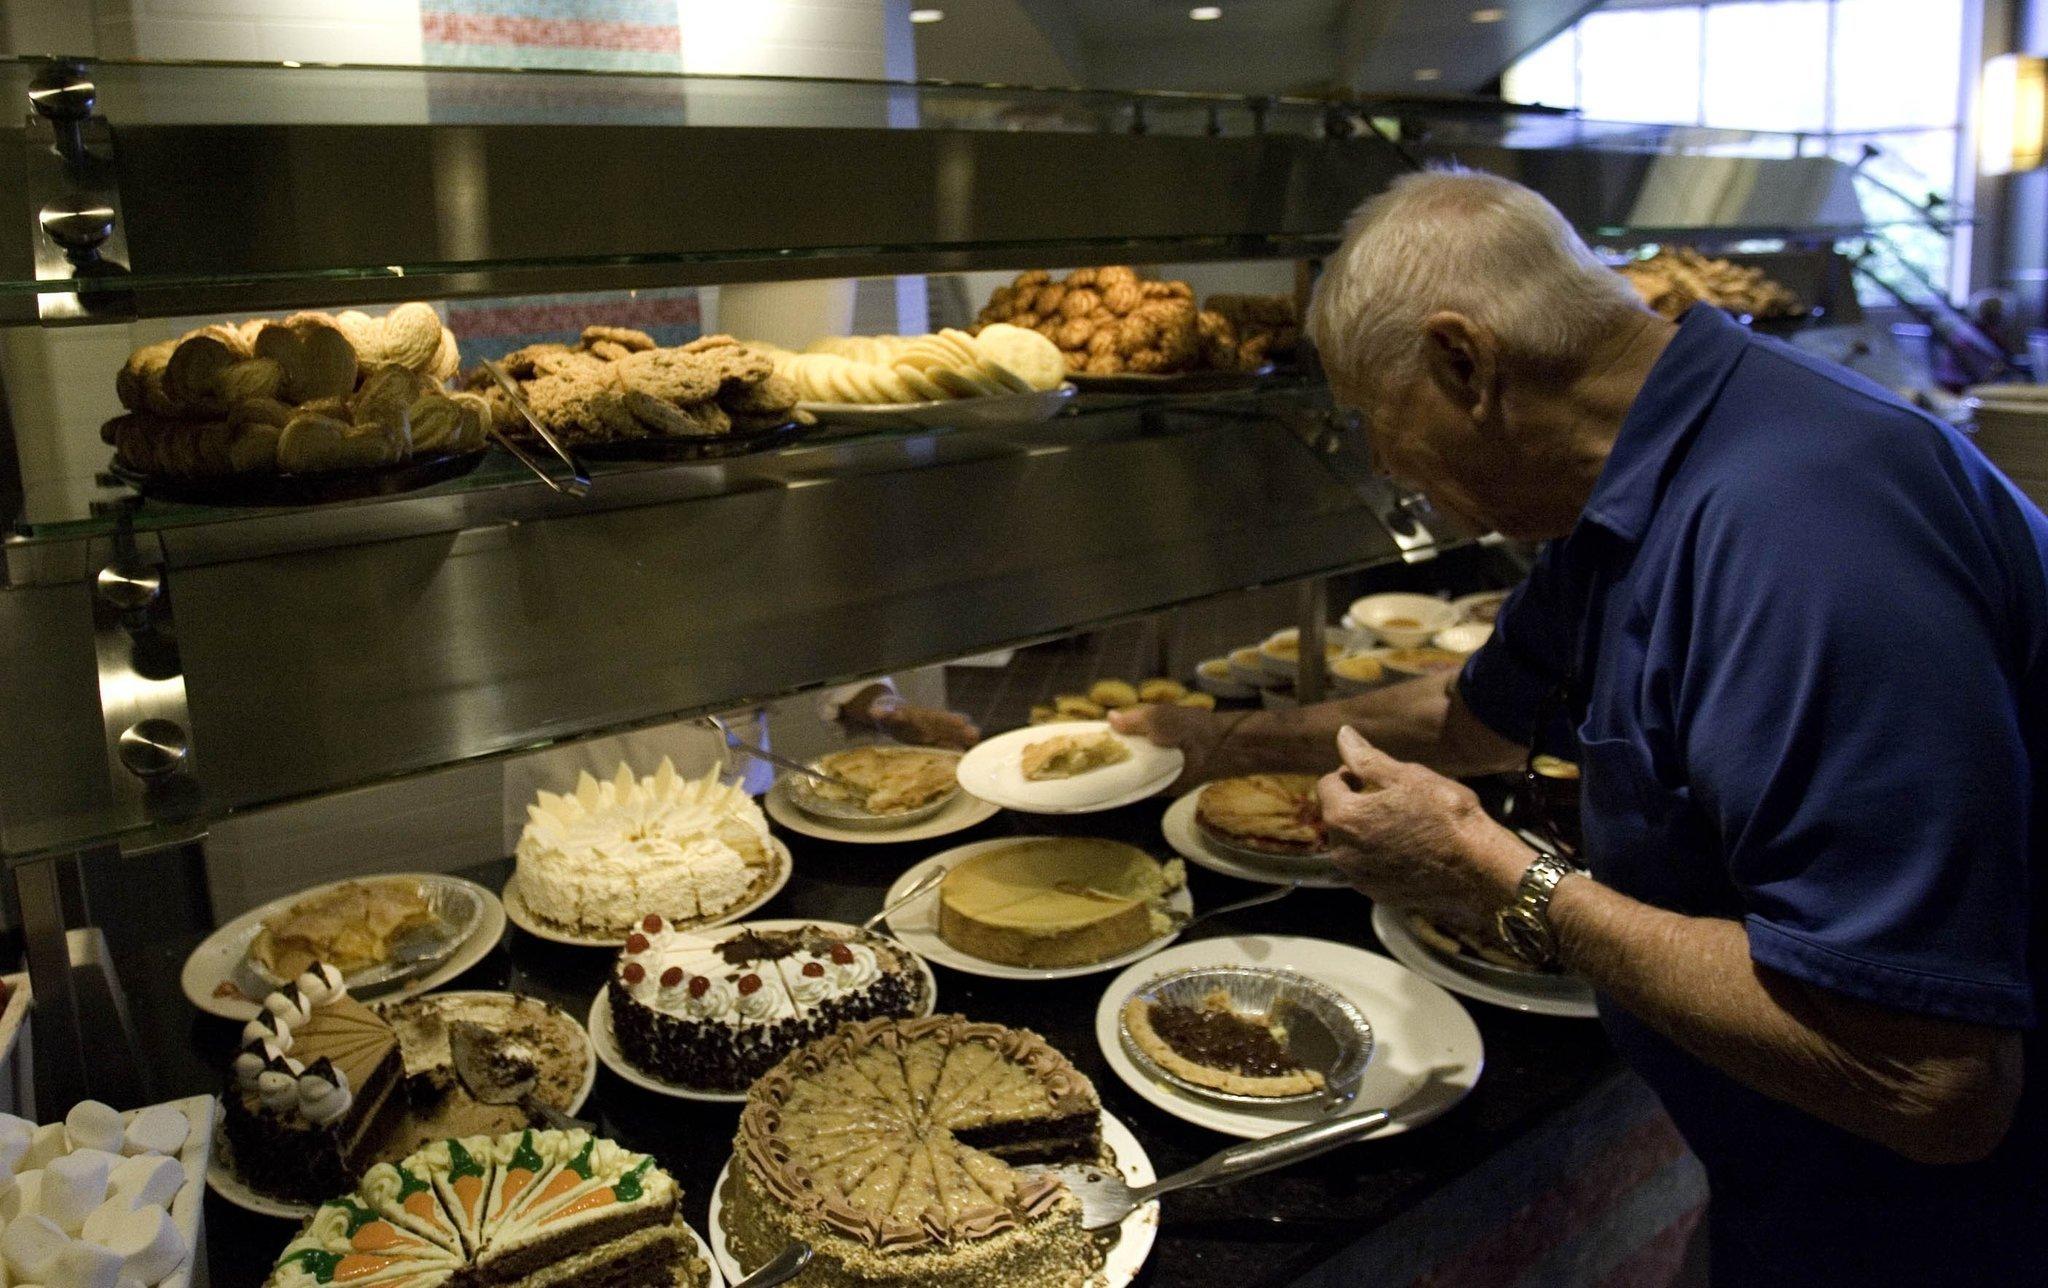 superdiners on casino dining in sd the san diego union tribune rh sandiegouniontribune com Barona Buffet Casino and Resort Barona Casino Buffet Coupons